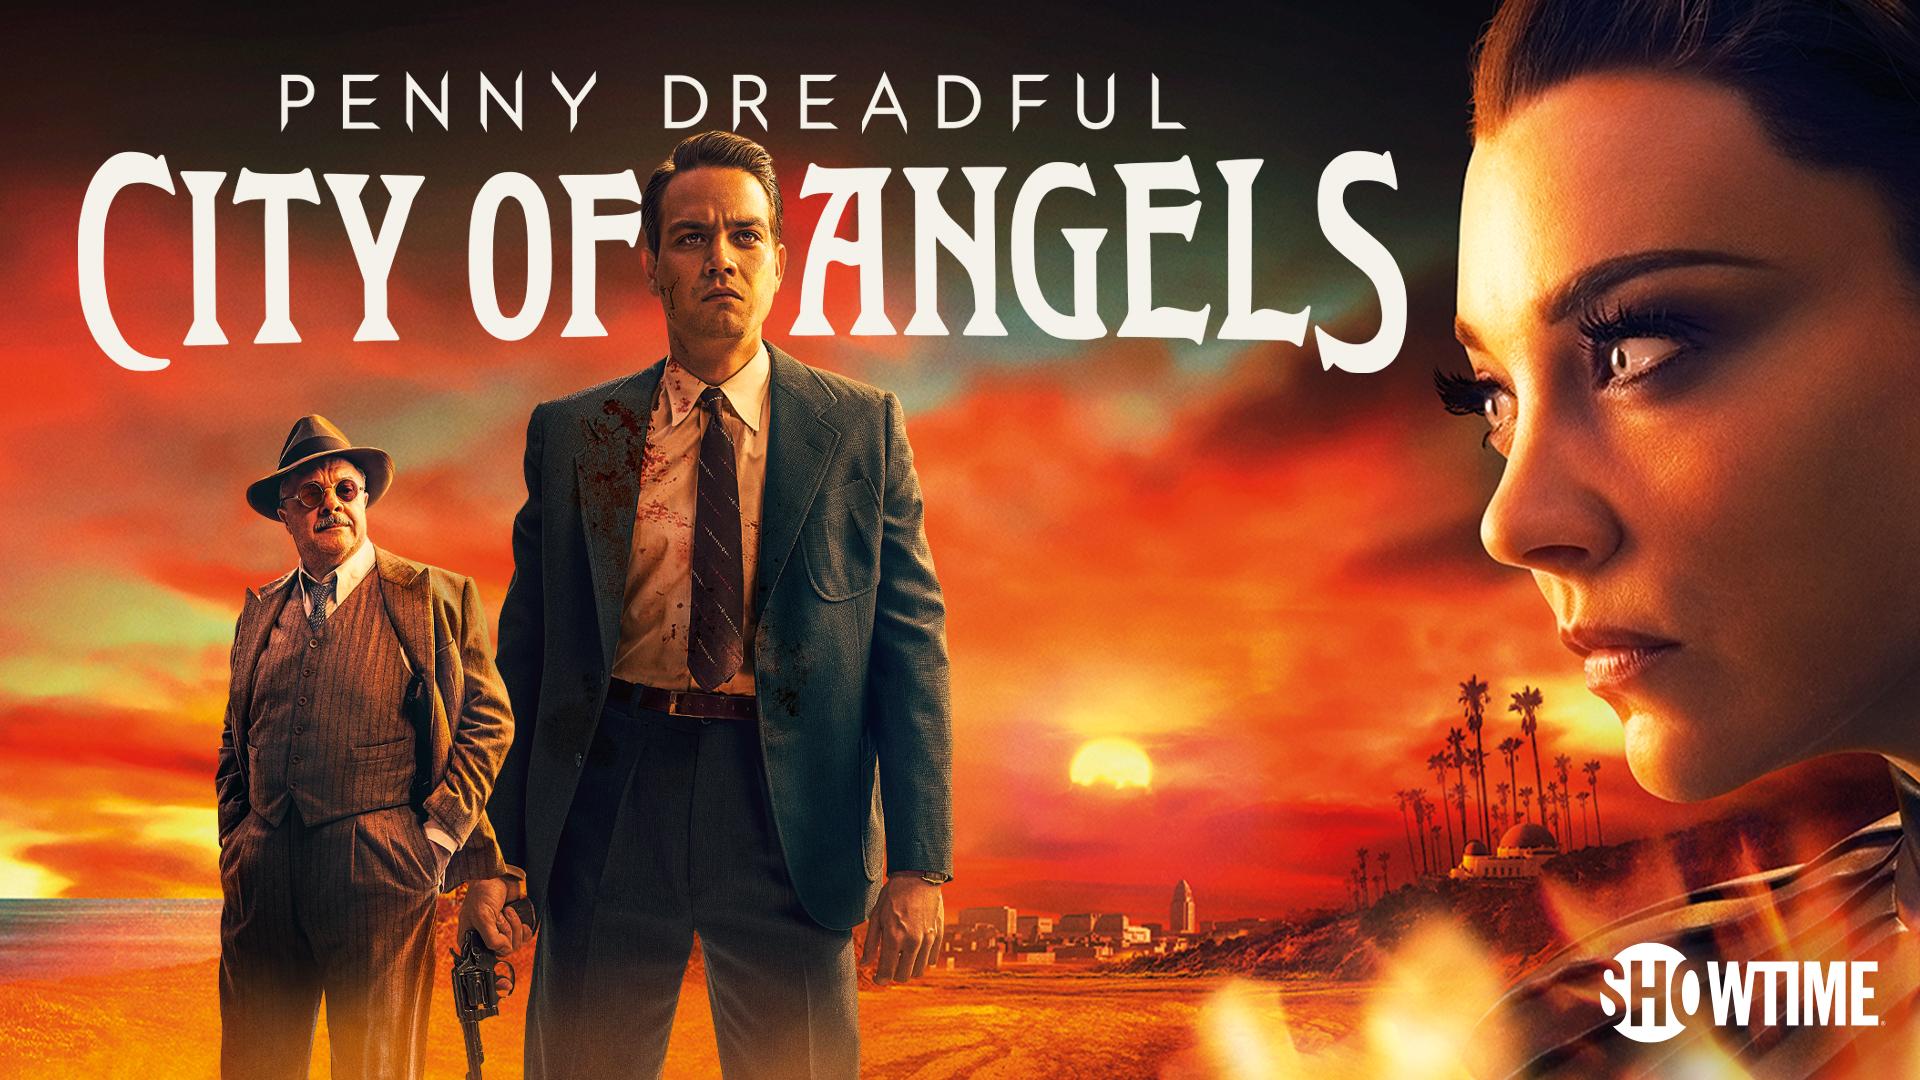 Penny Dreadful - City of Angels Season 1